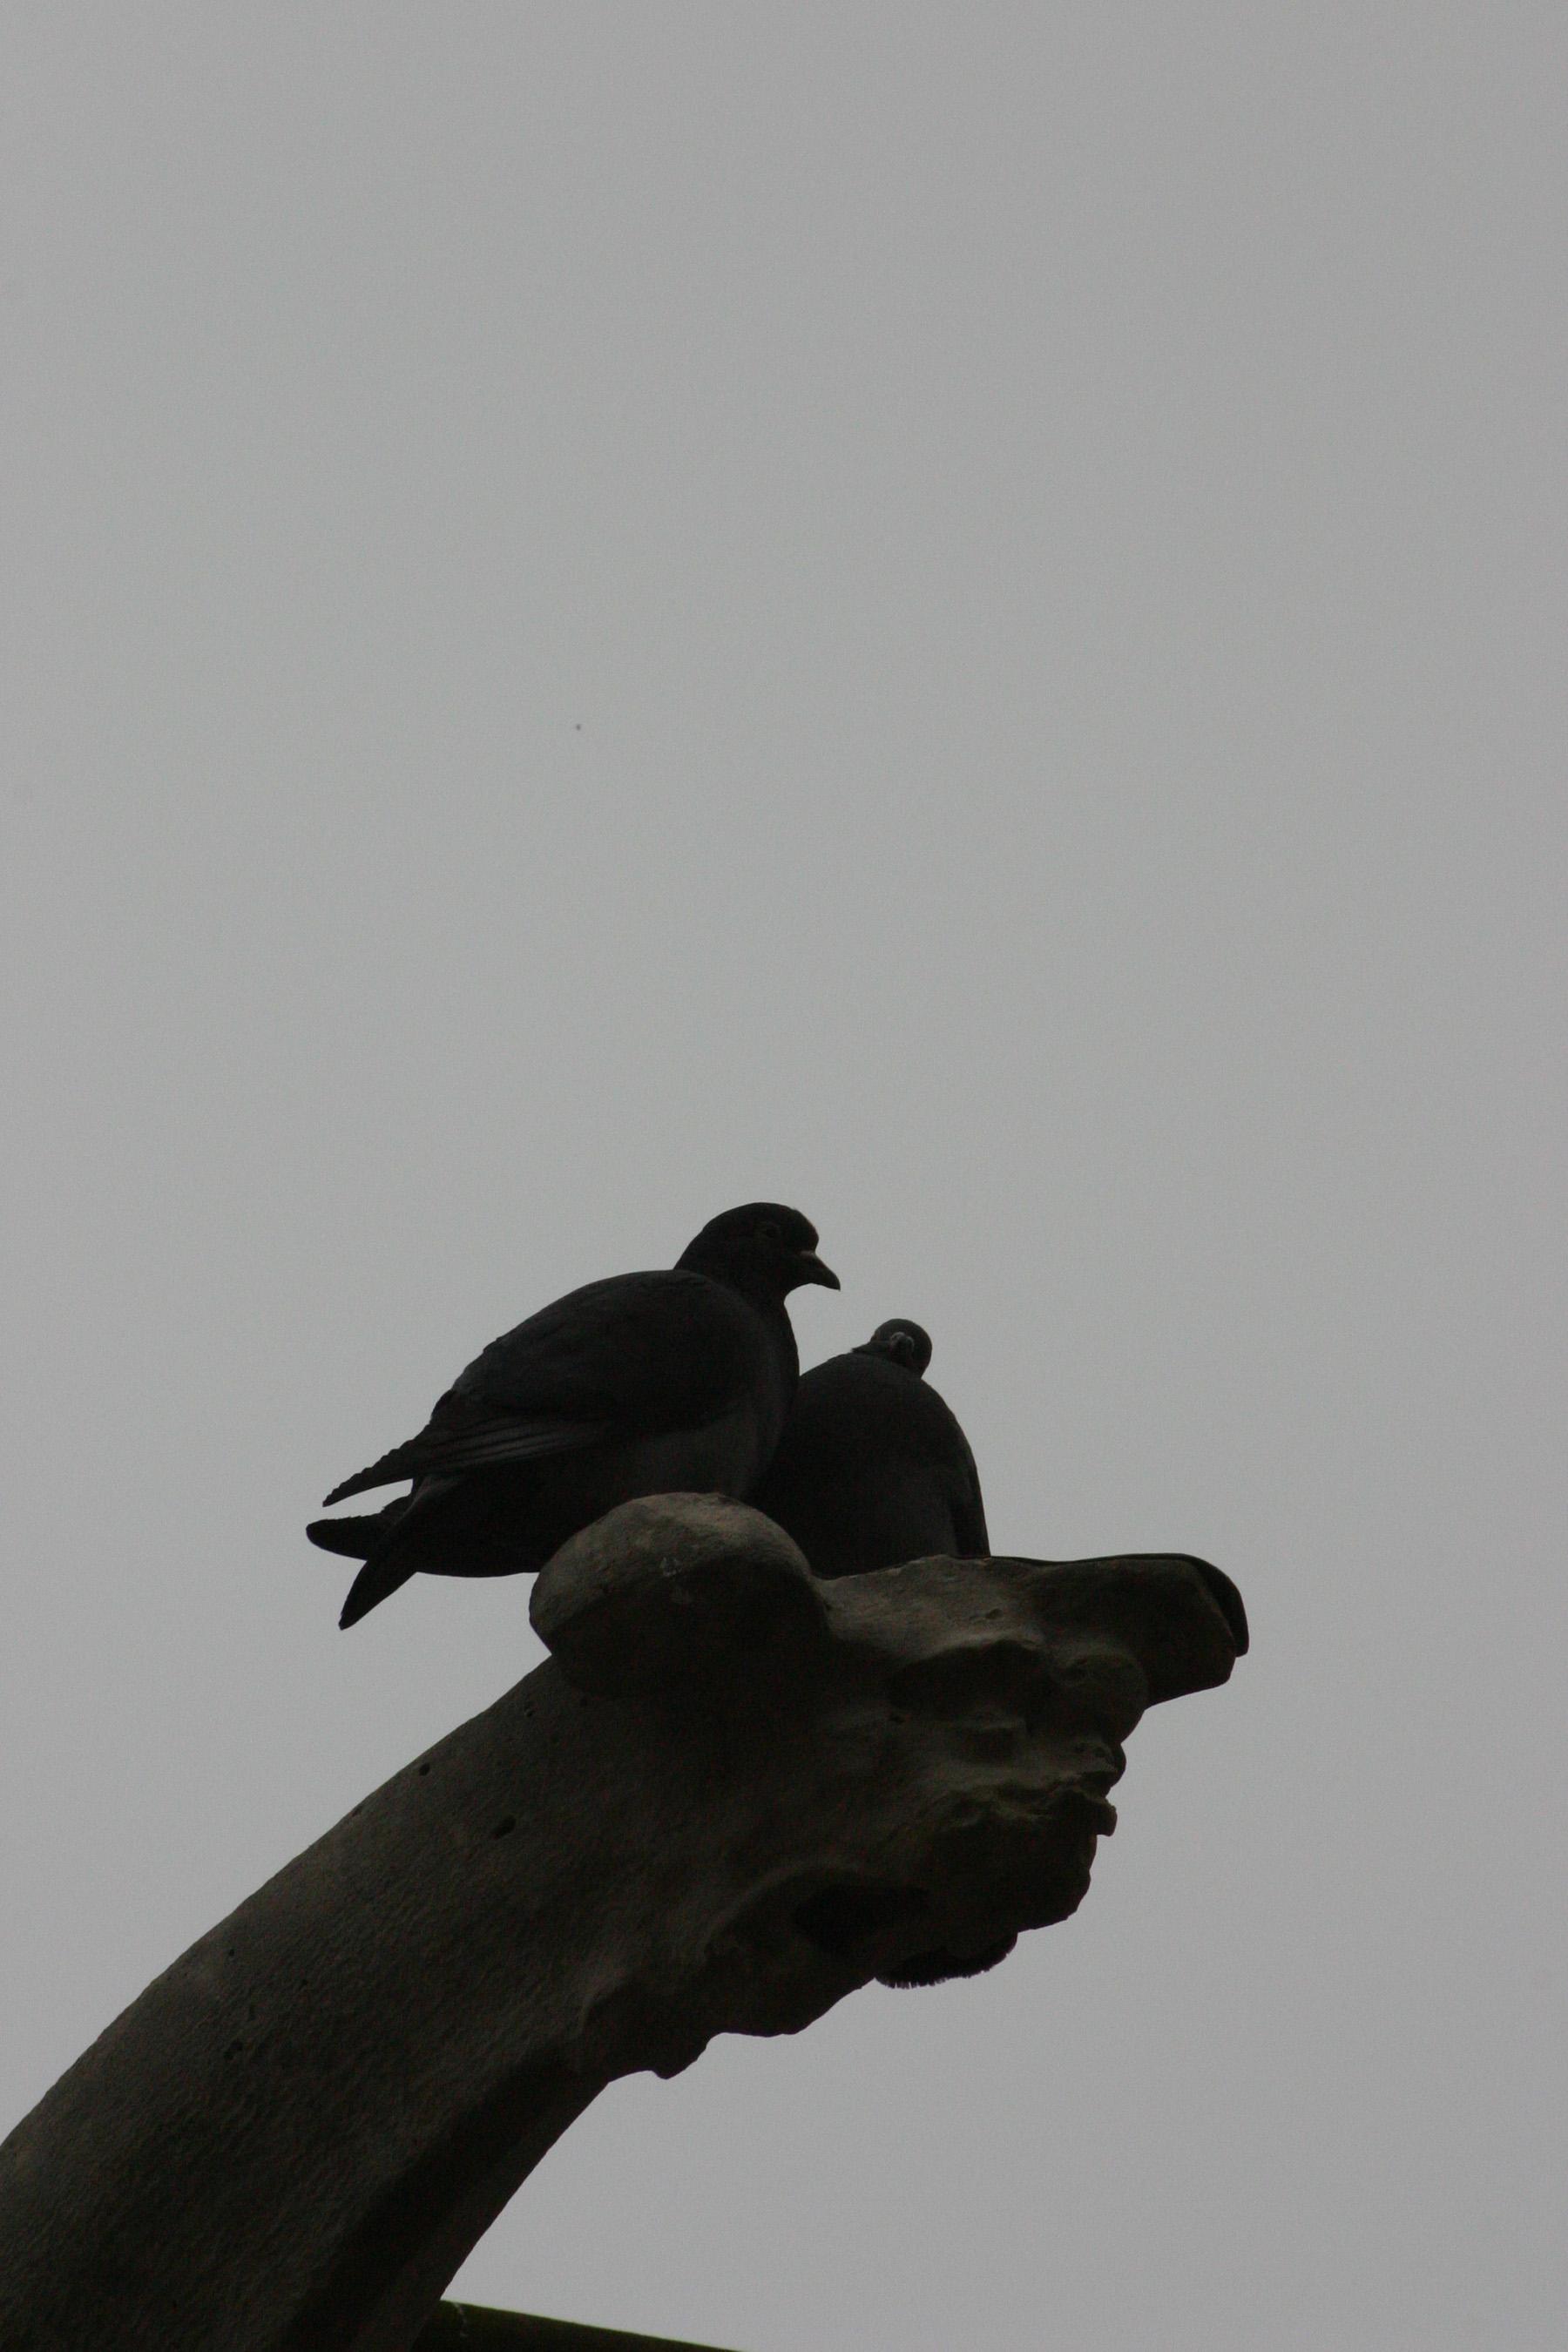 Ombres de pigeons